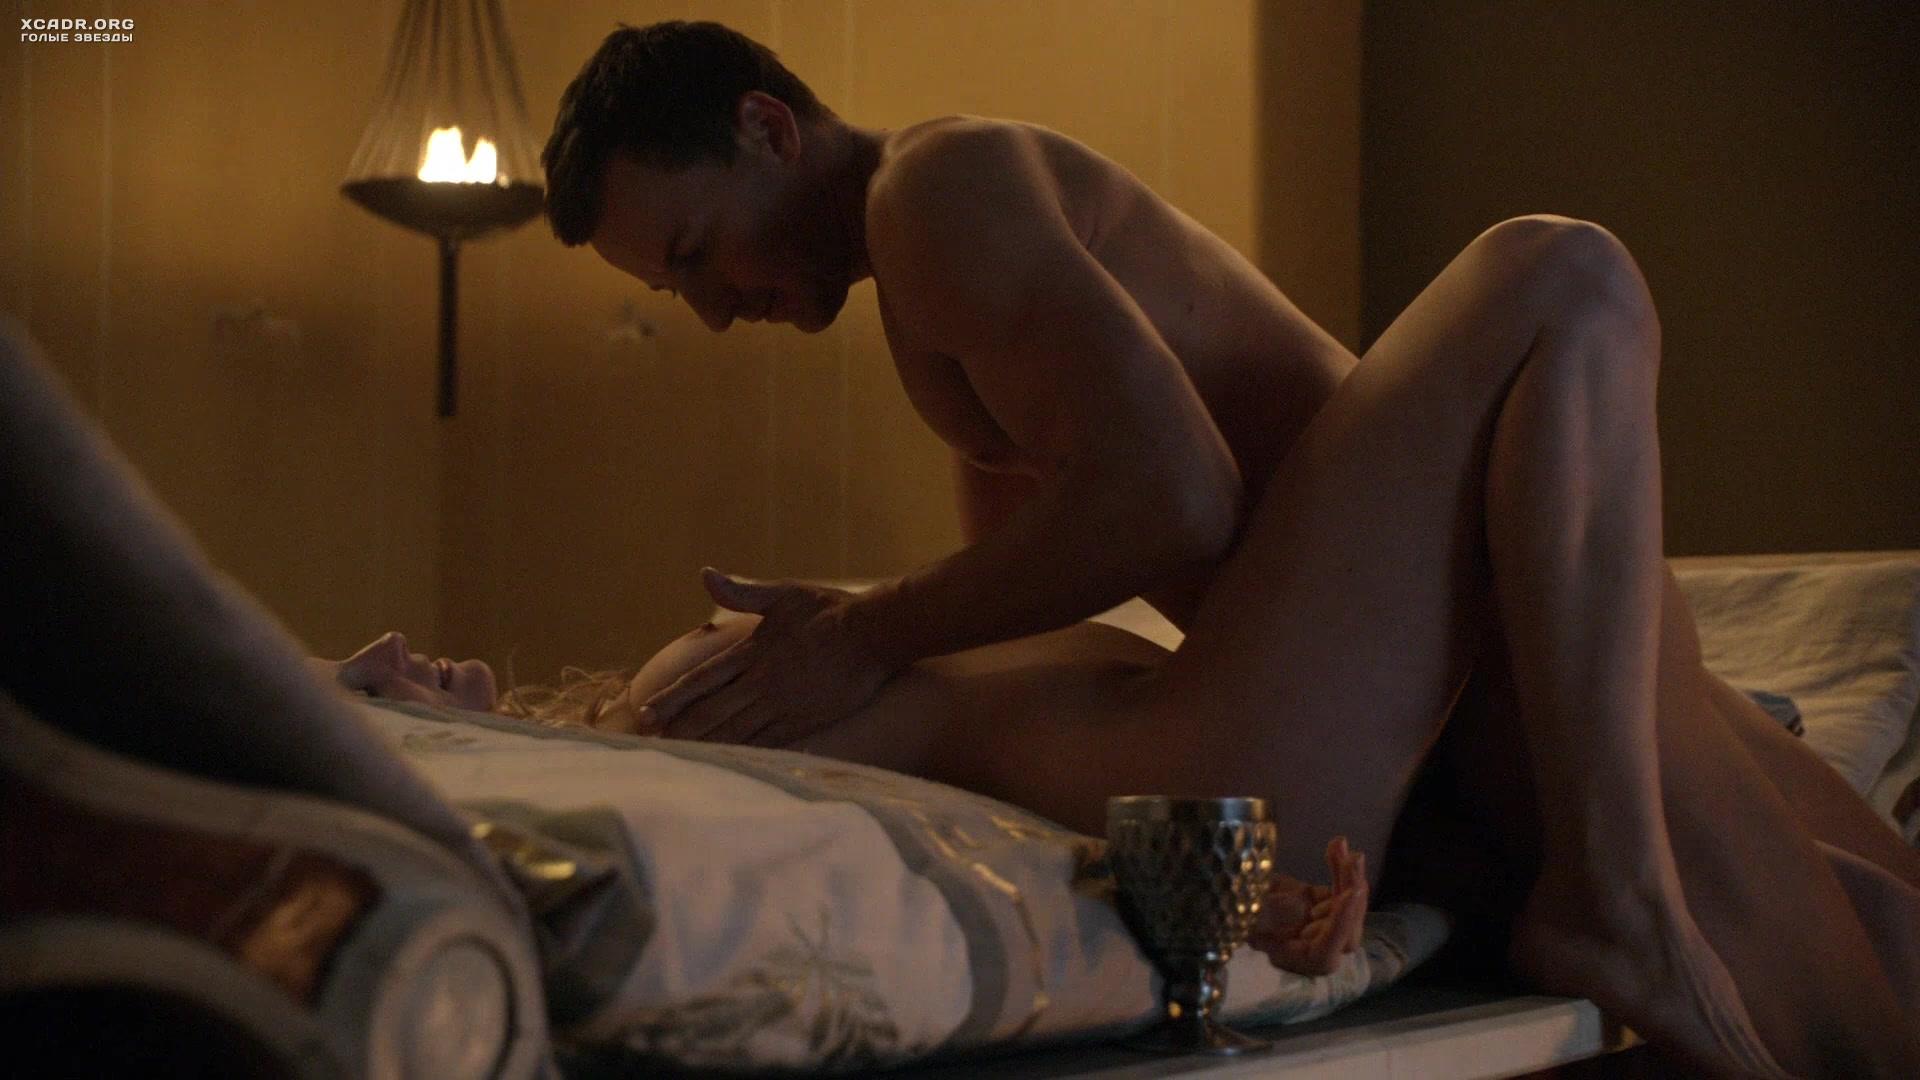 pron-sex-scenes-nicki-minaj-buttocks-nude